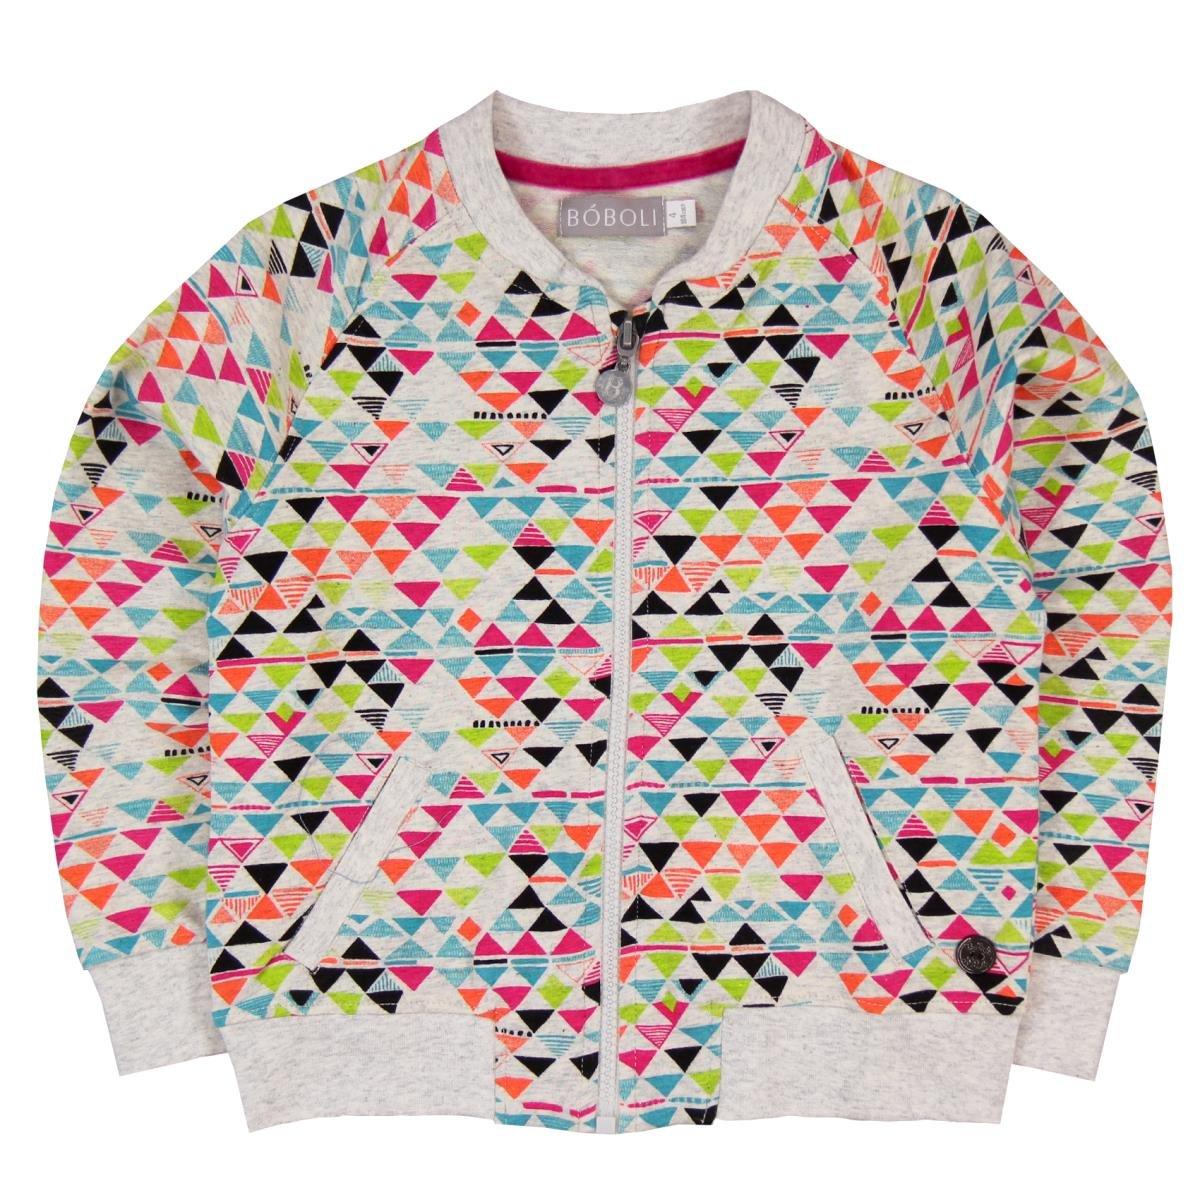 boboli Fleece Jacket For Girl, Sudadera para Niños Mehrfarbig (Print 9446) 24 Meses Bóboli 463137-9446